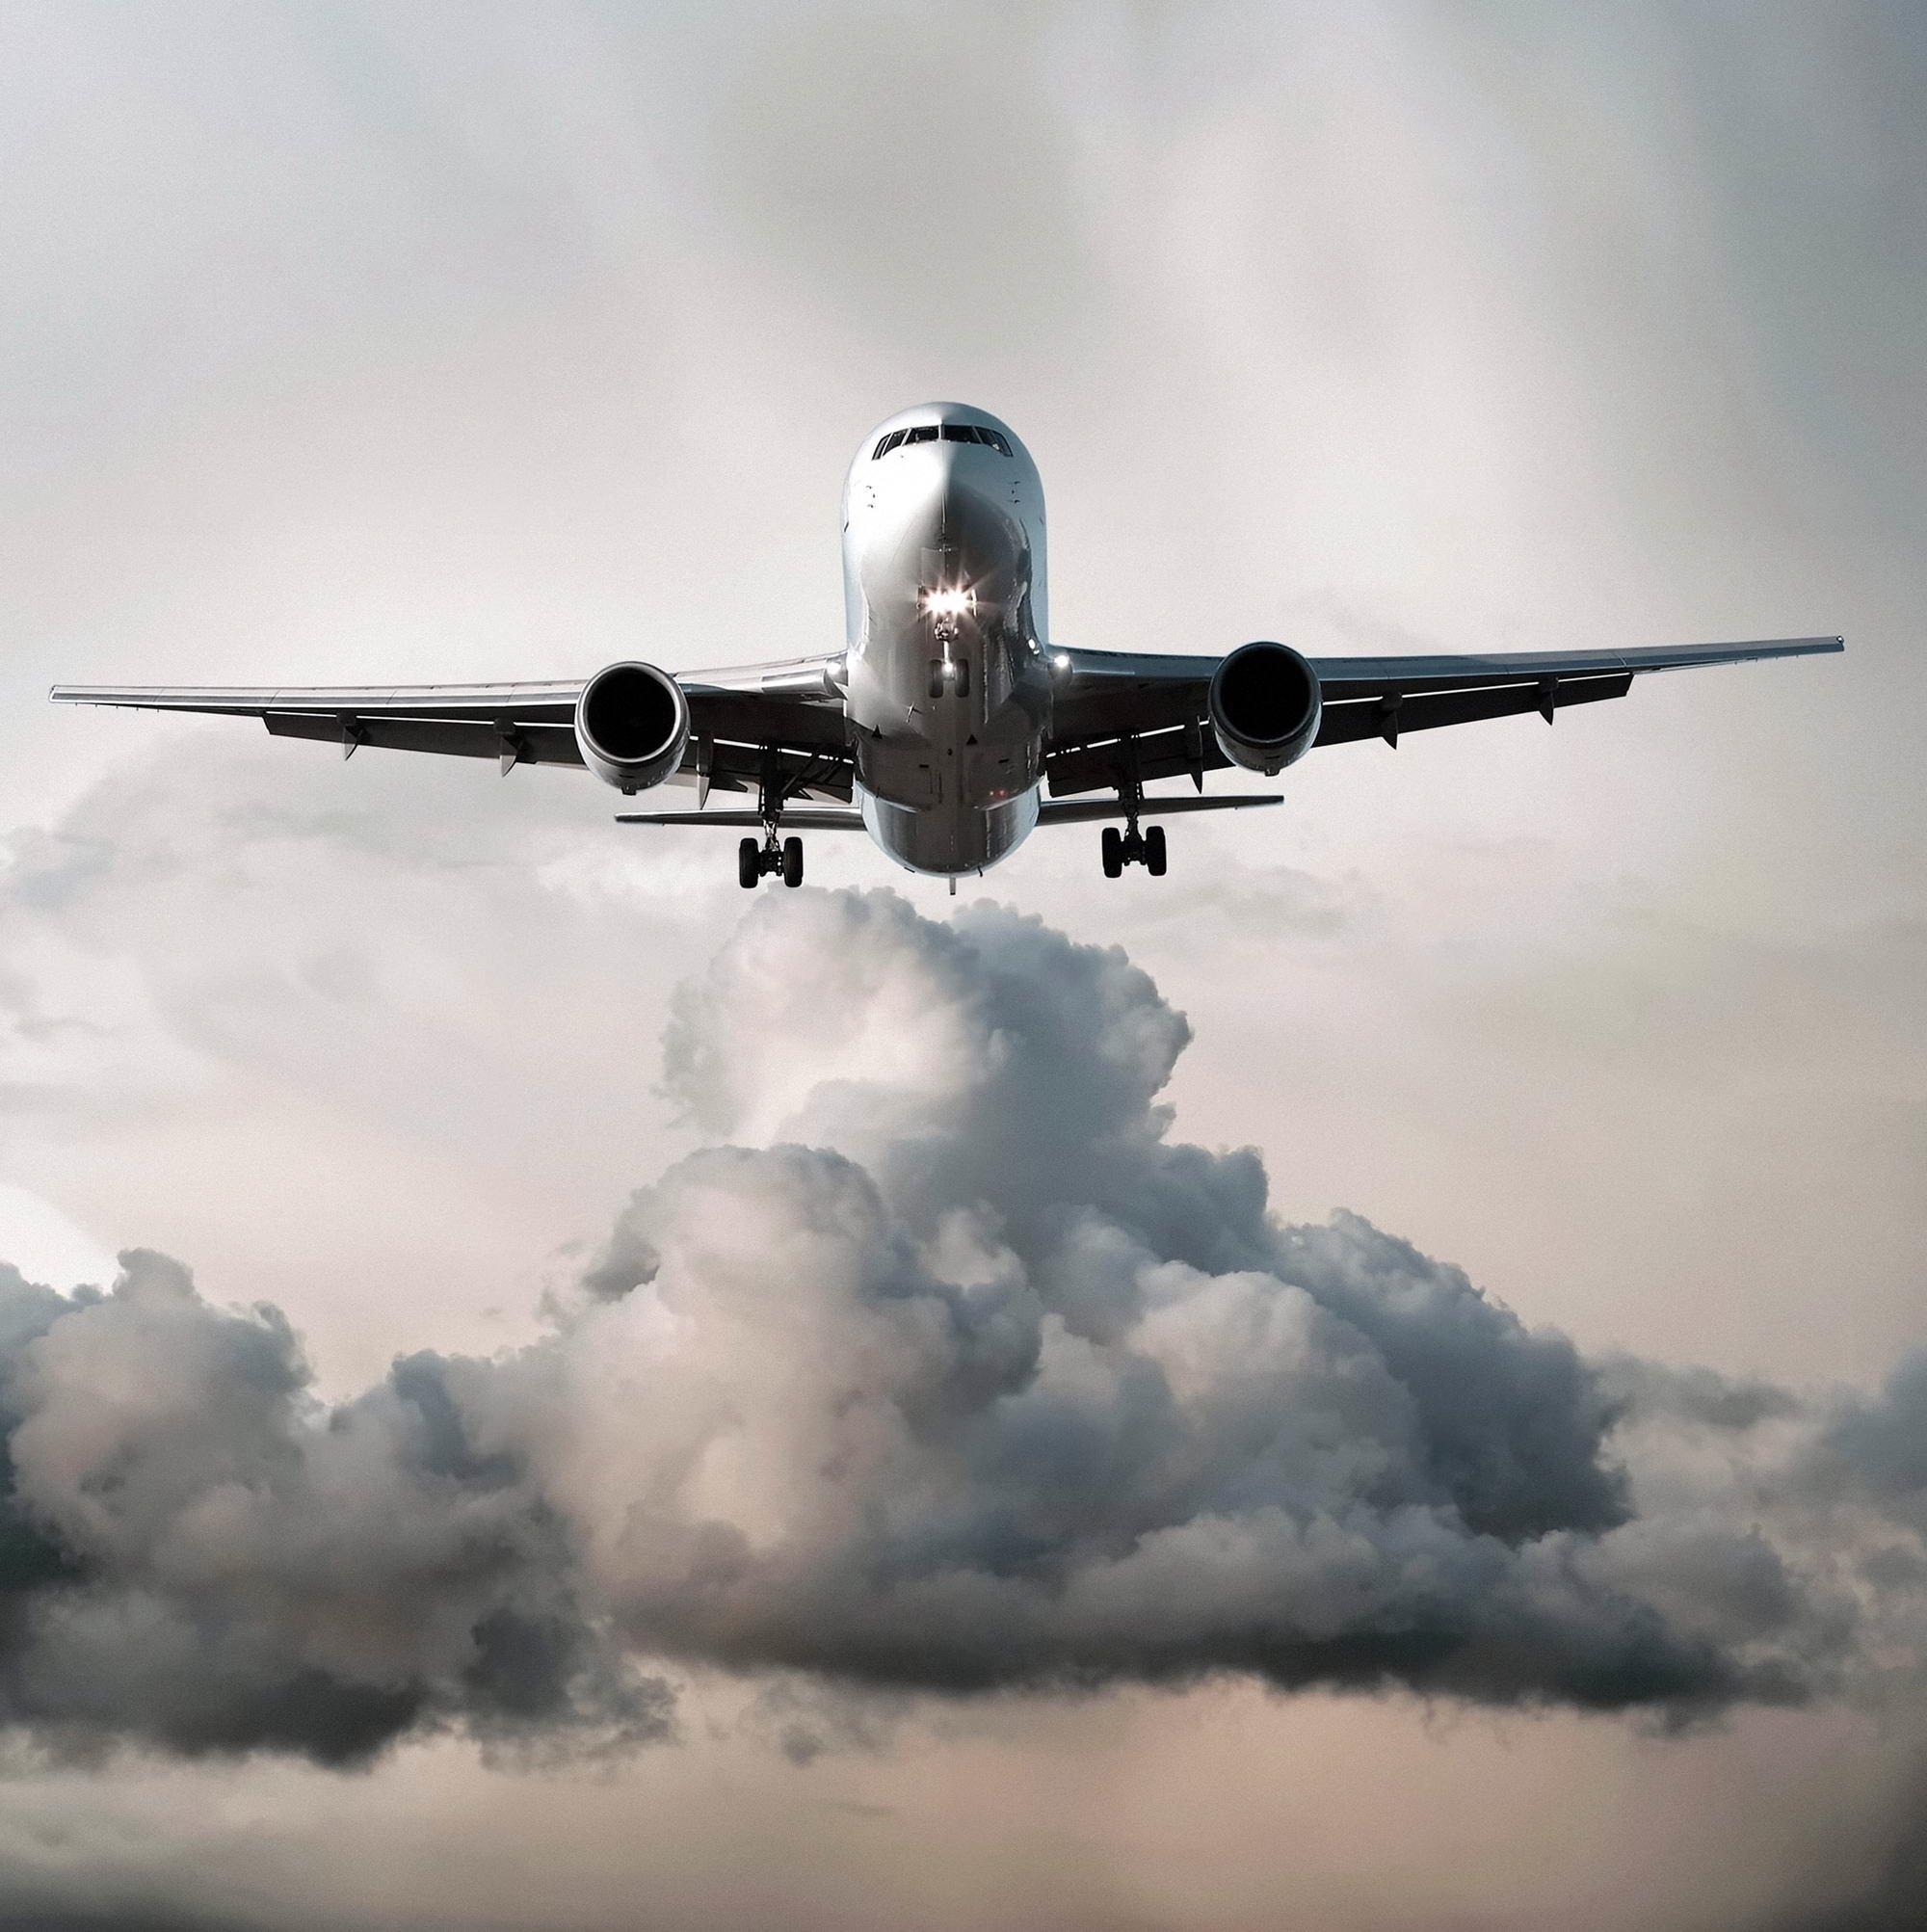 Права и обязанности пассажиров на воздушном транспорте